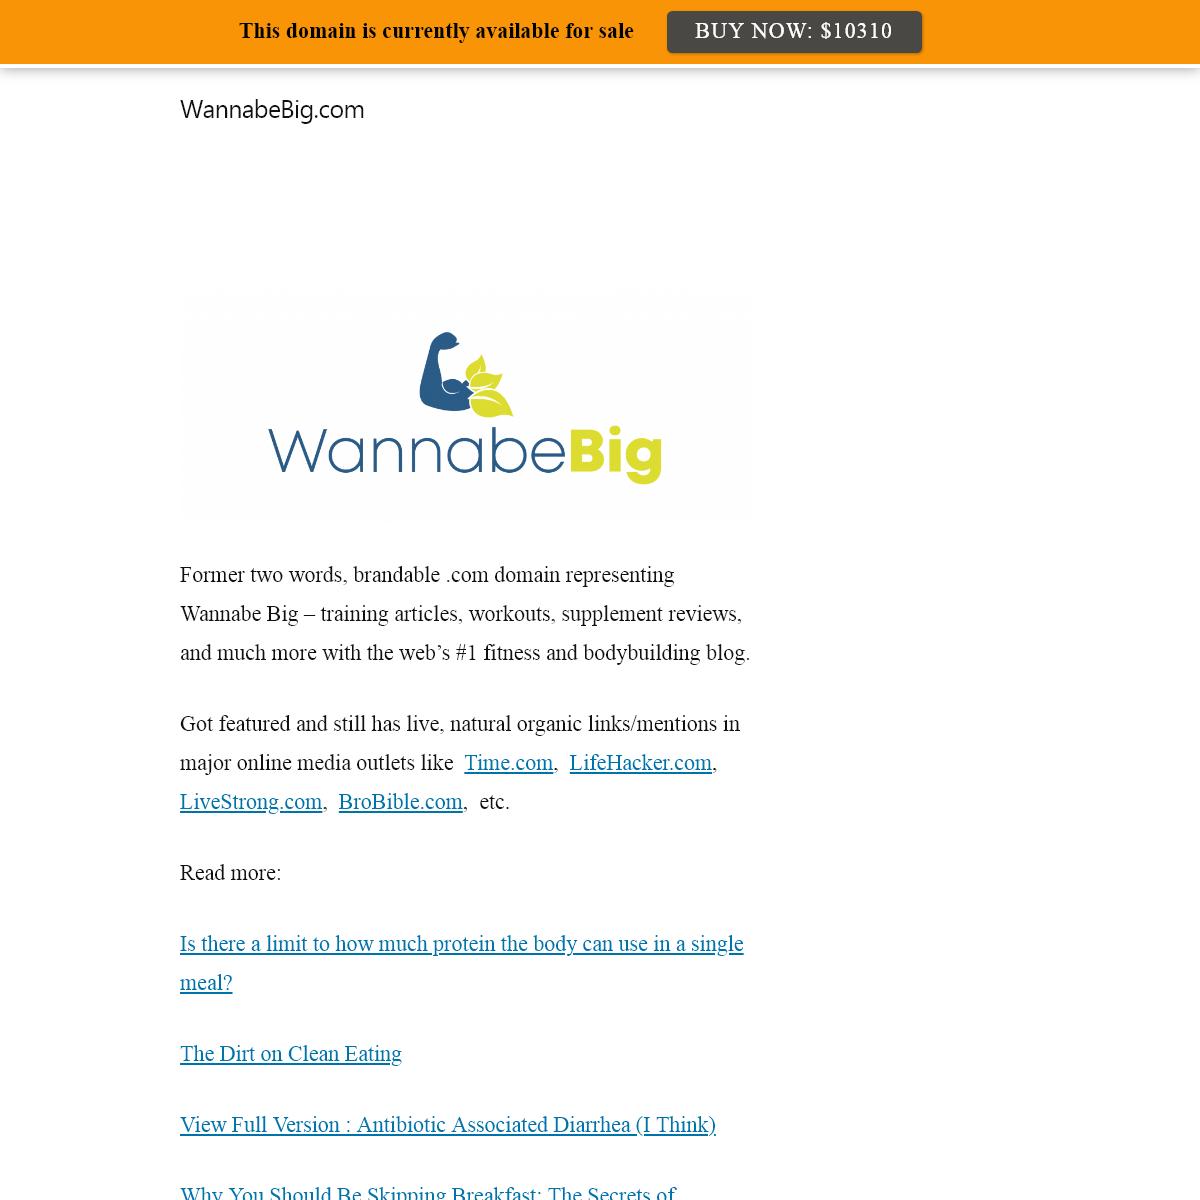 - WannabeBig.com